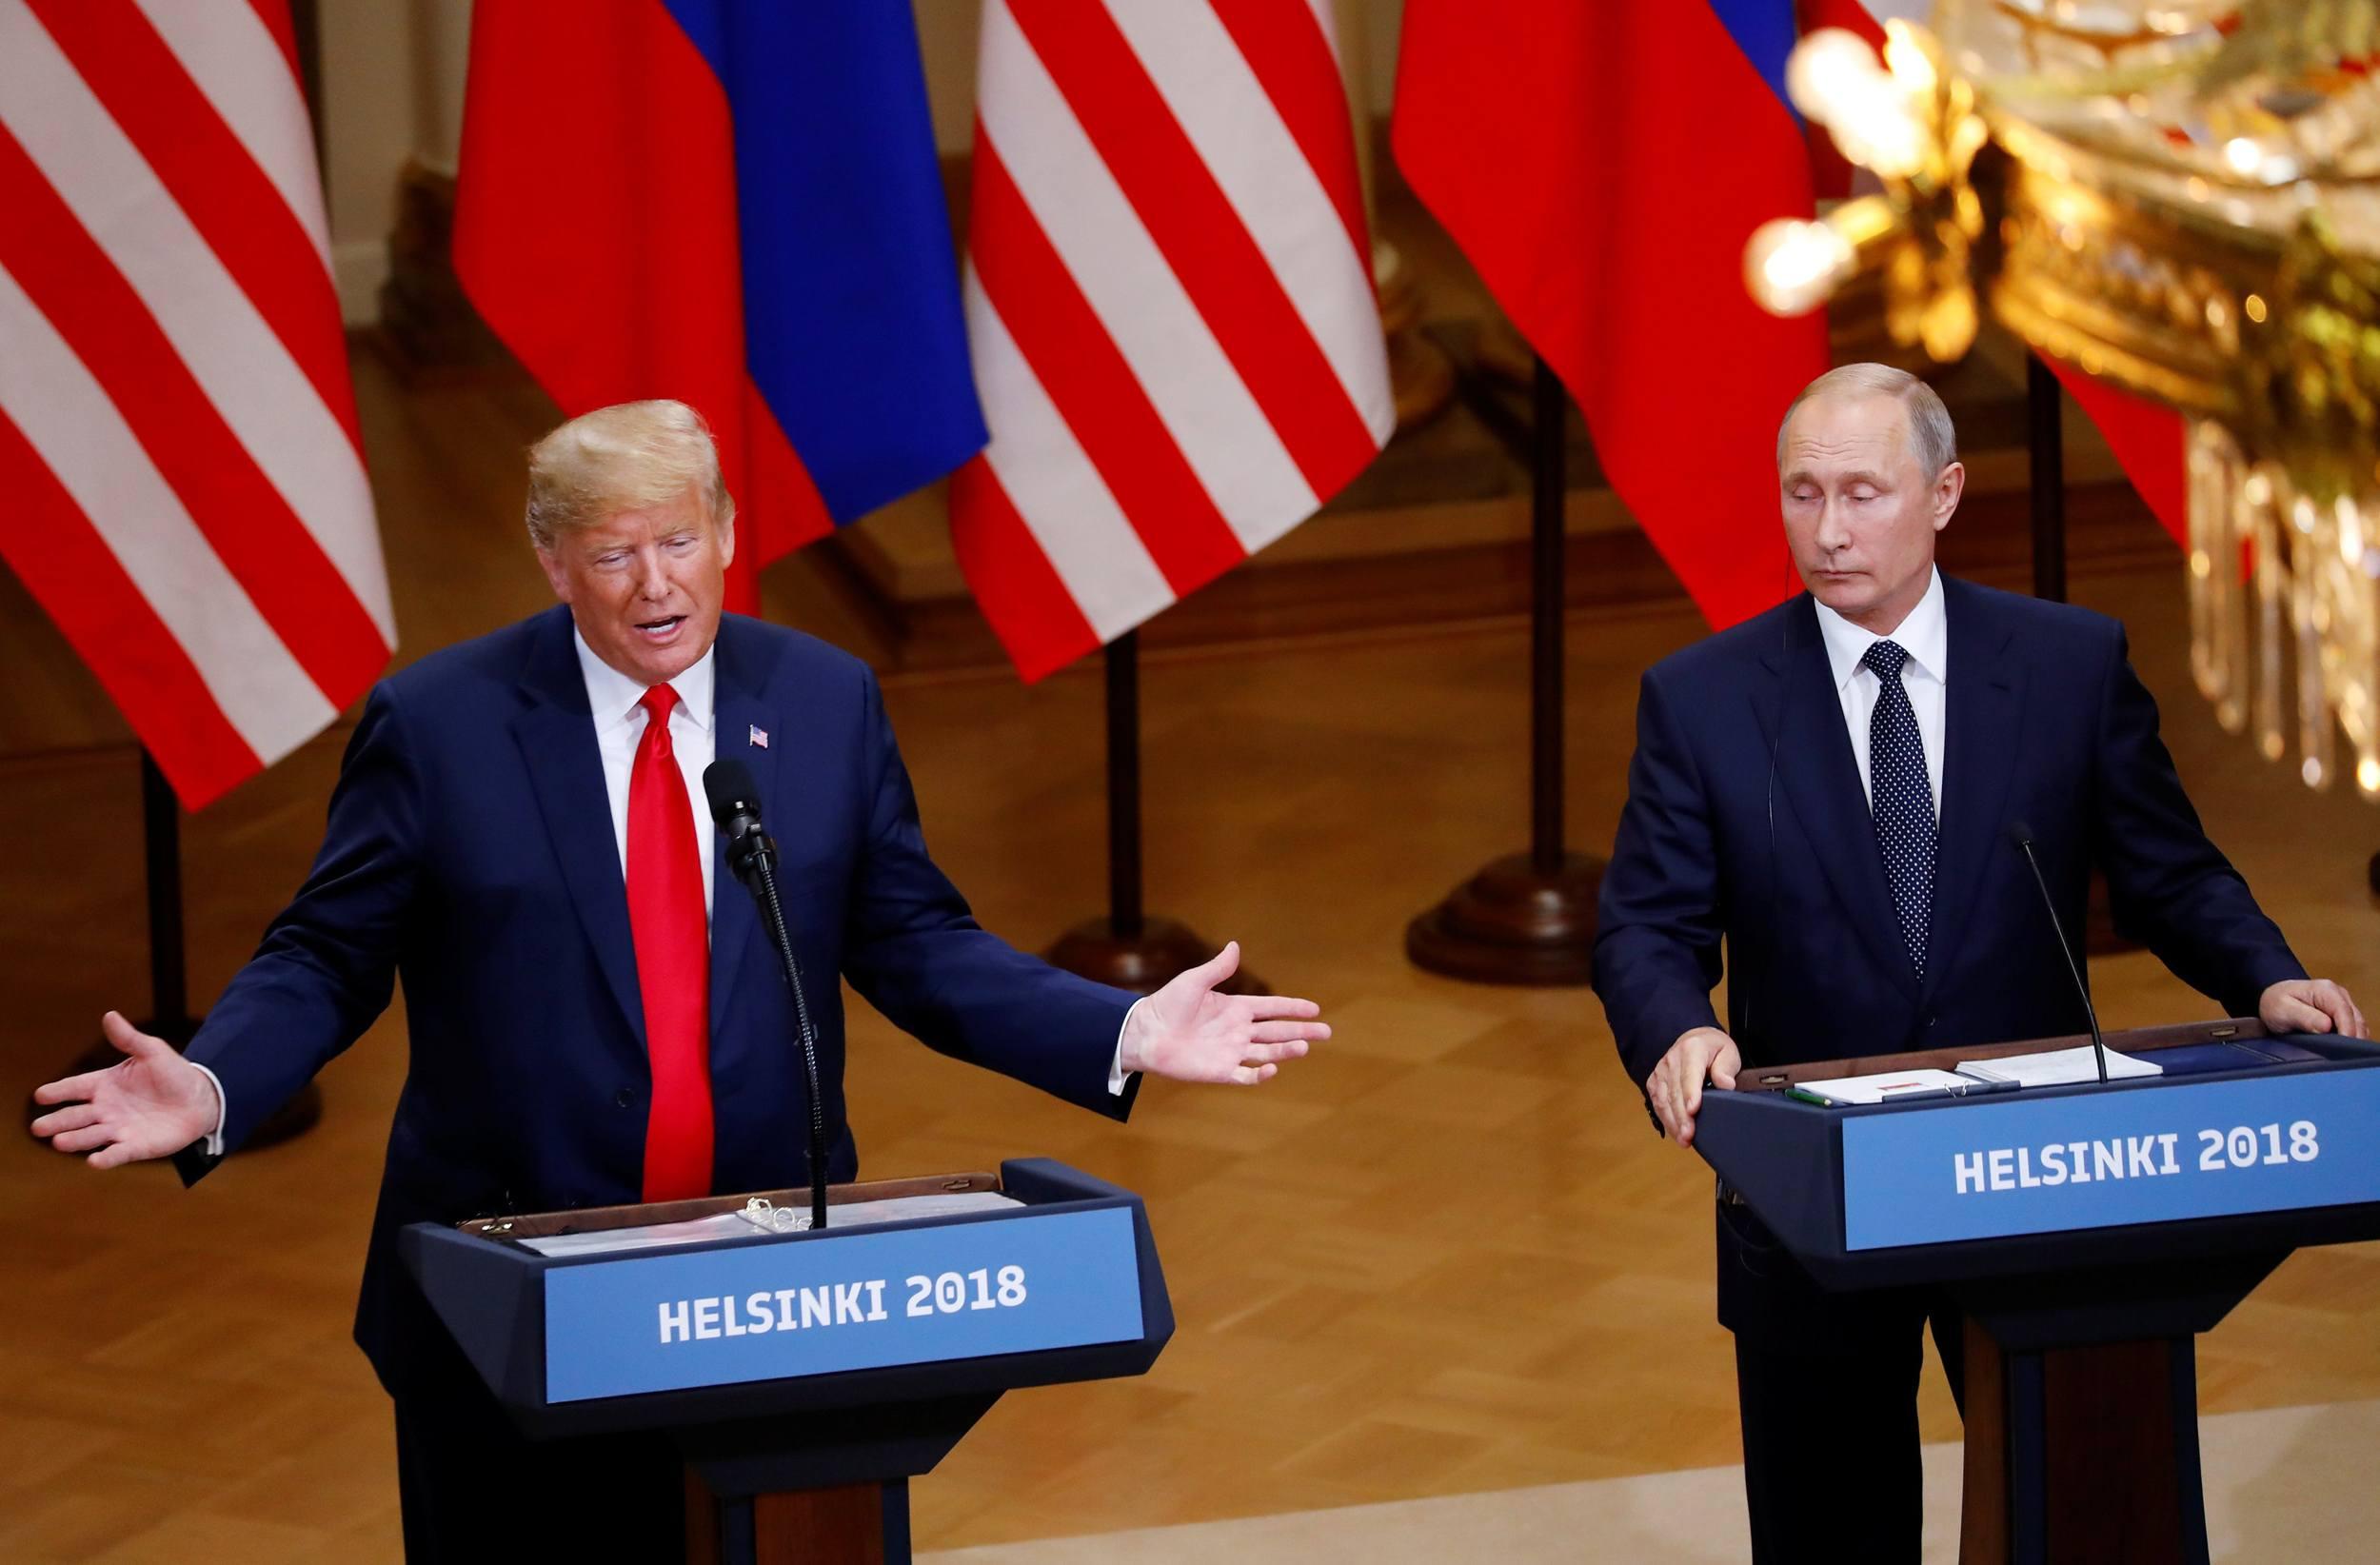 Donald Trump and Vladimir Putin in Helsinki